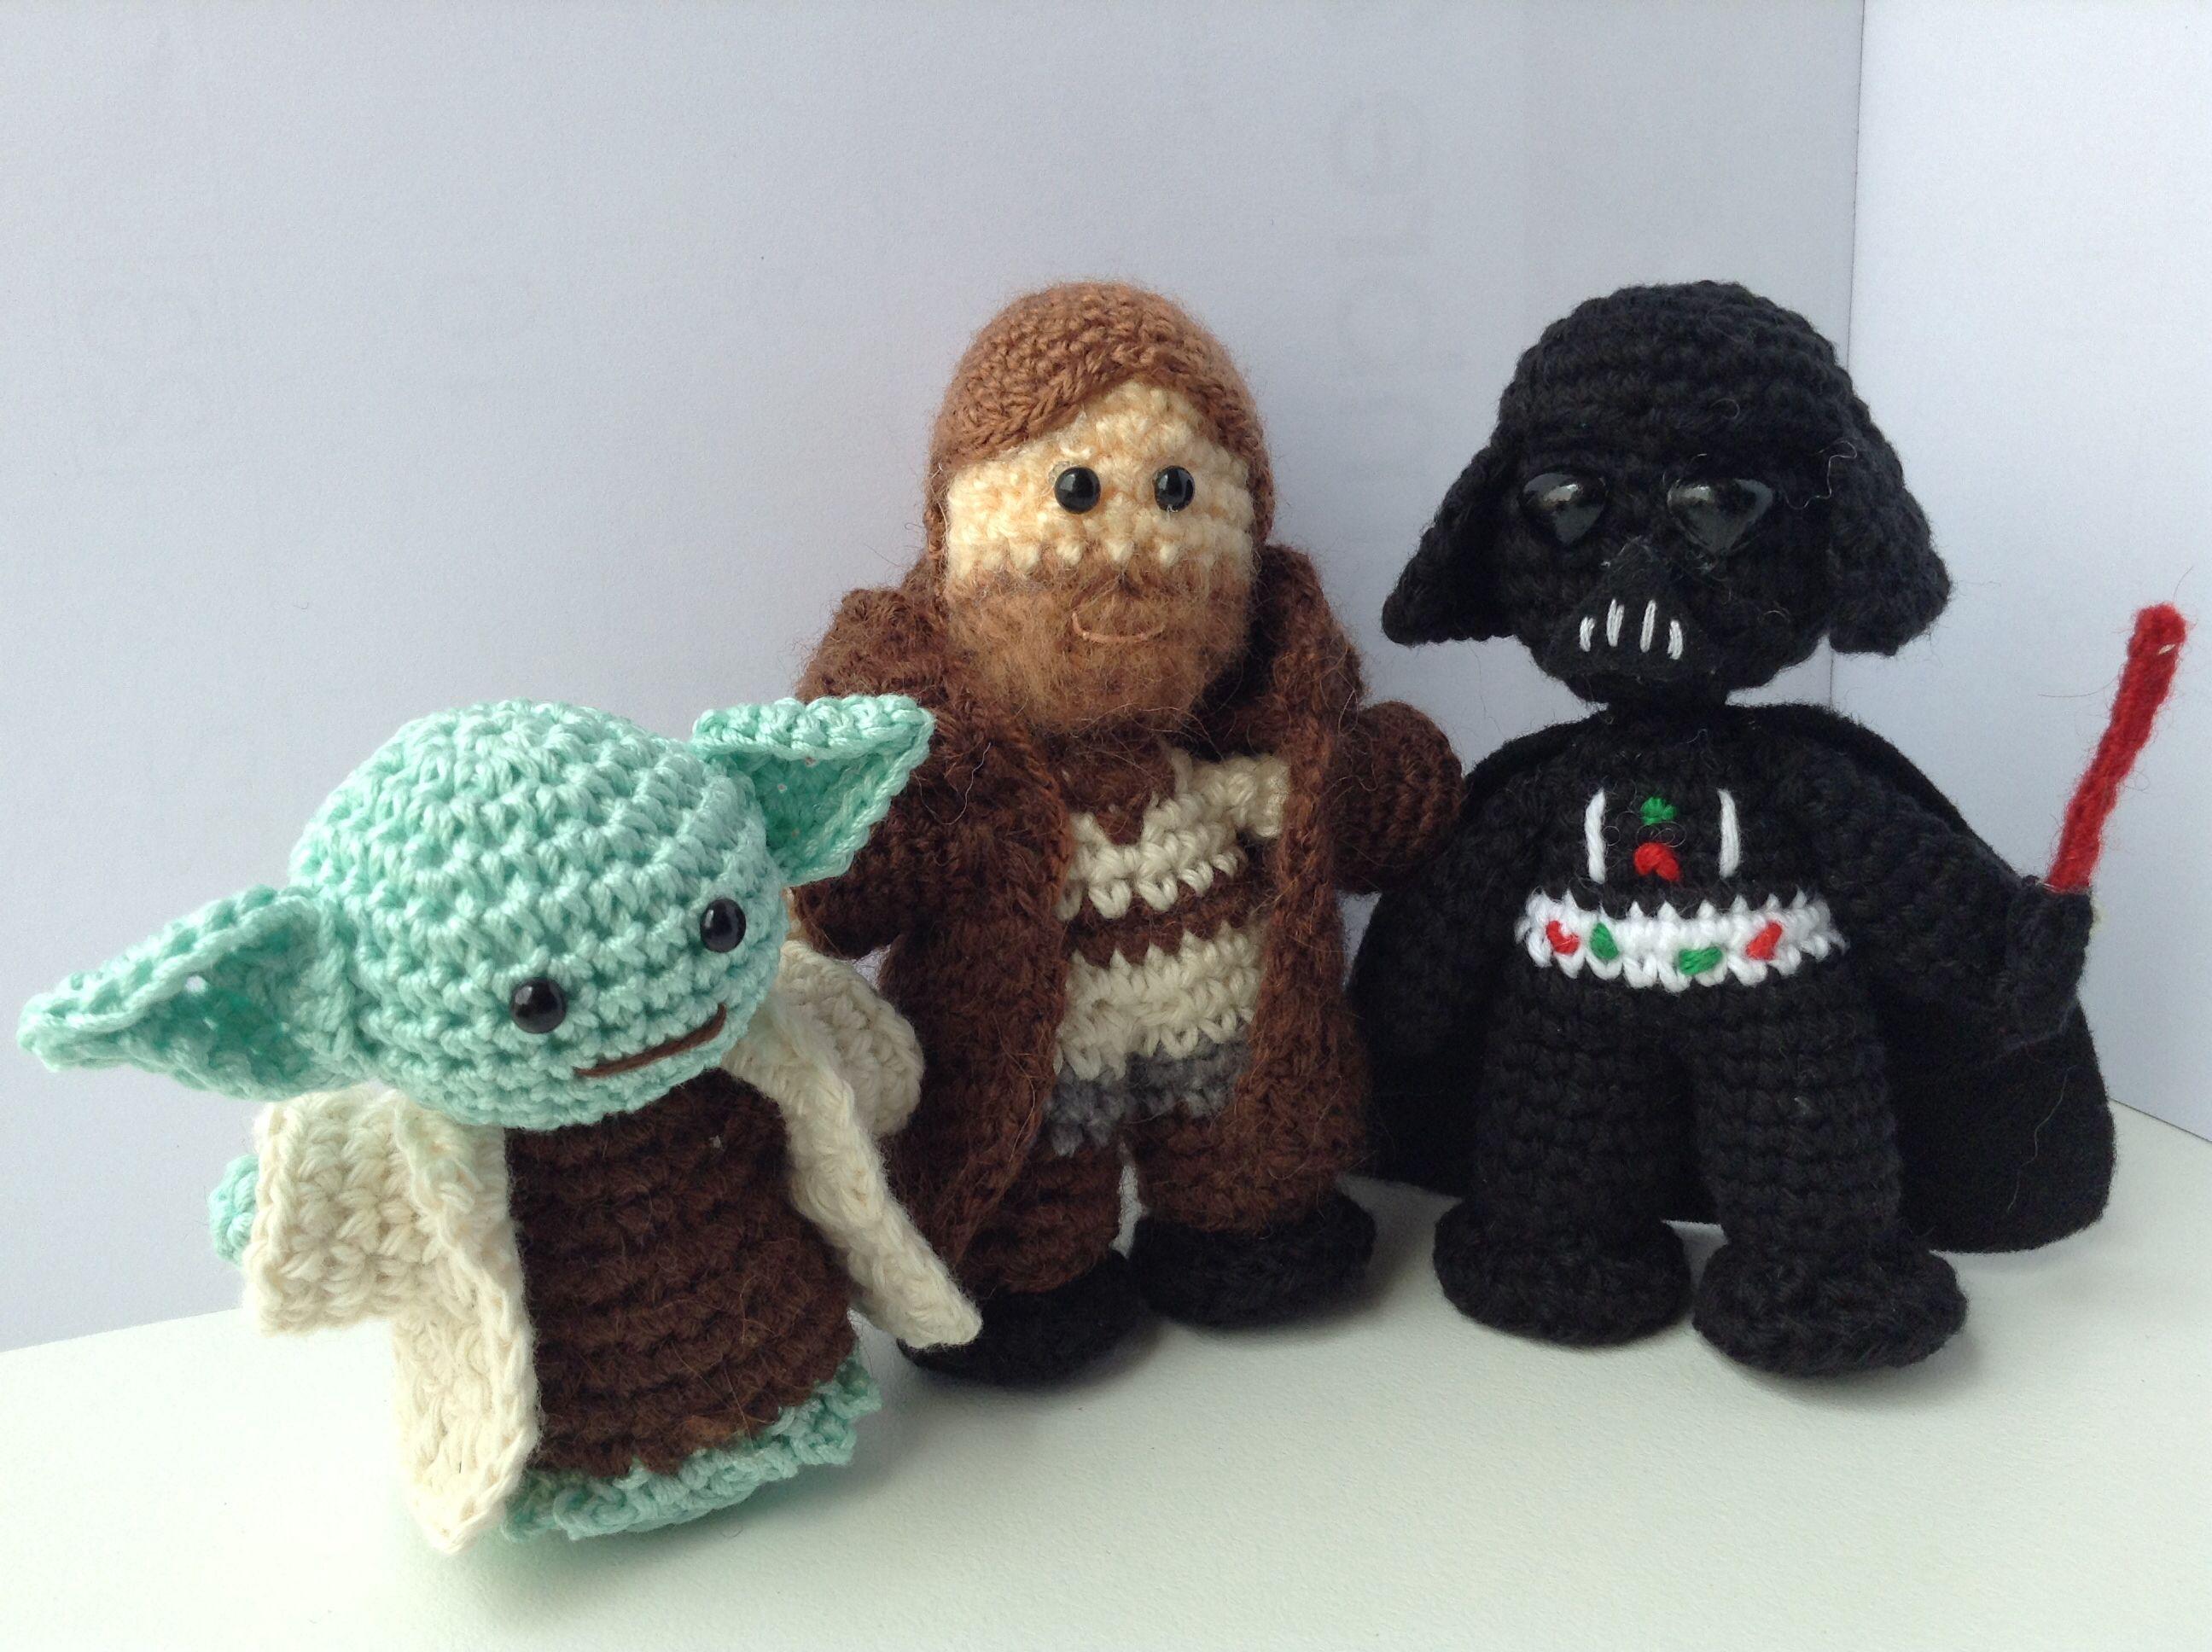 Darth Vader Star Wars amigurumi tejido a crochet - YouTube | 1936x2592